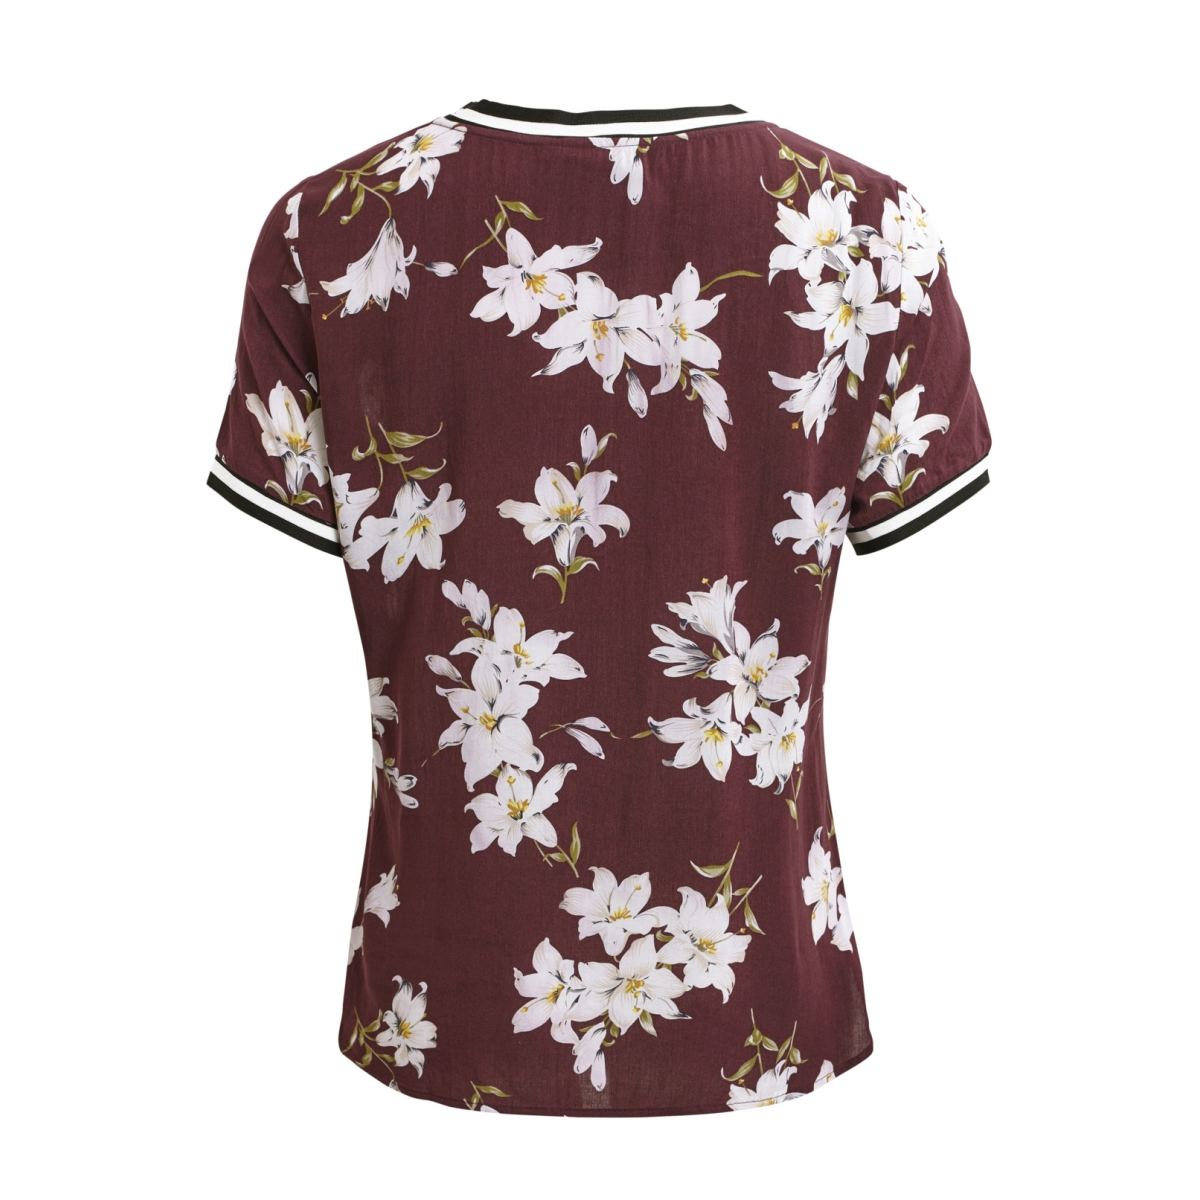 objtriny s/s top a 23025369 object t-shirt winetasting